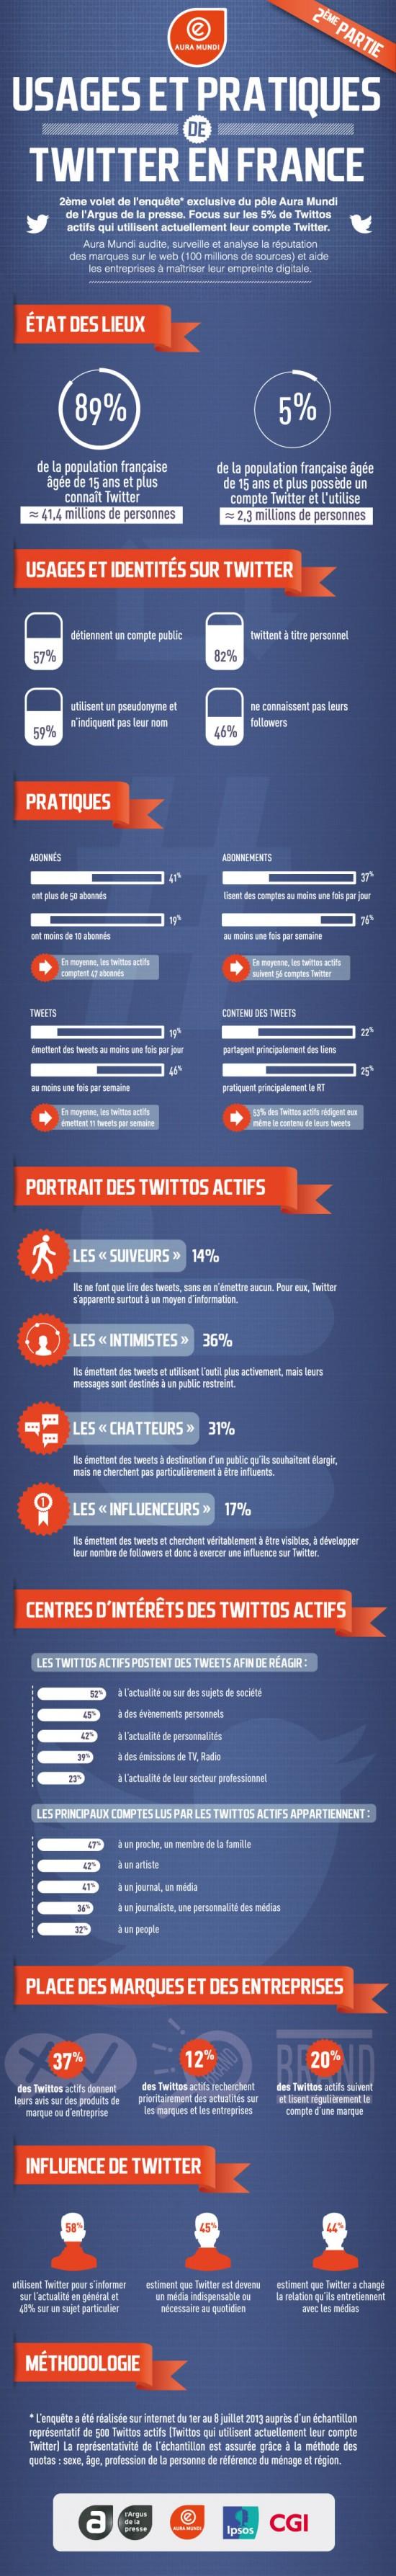 infographie-Twitter-V2-550x3575 Infographie - Les usagers de Twitter en France